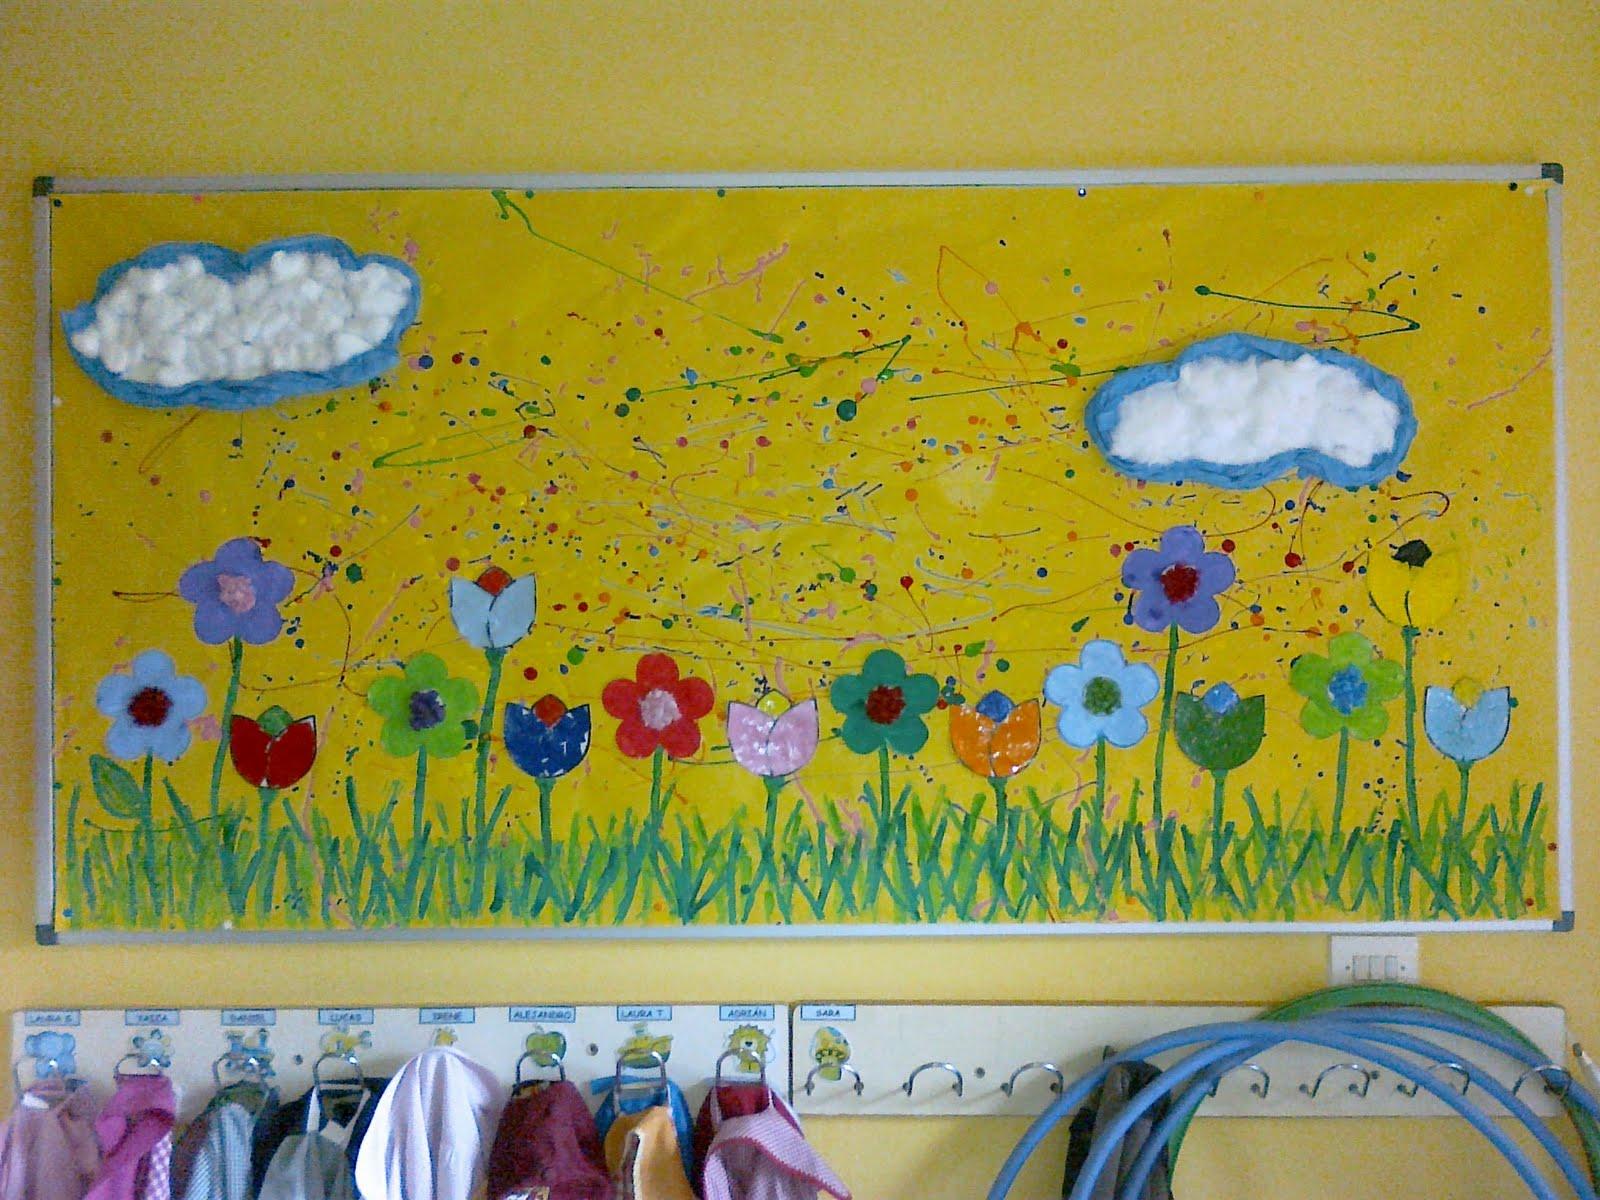 Peri dico mural primavera educaci n preescolar la revista for Diario mural en ingles